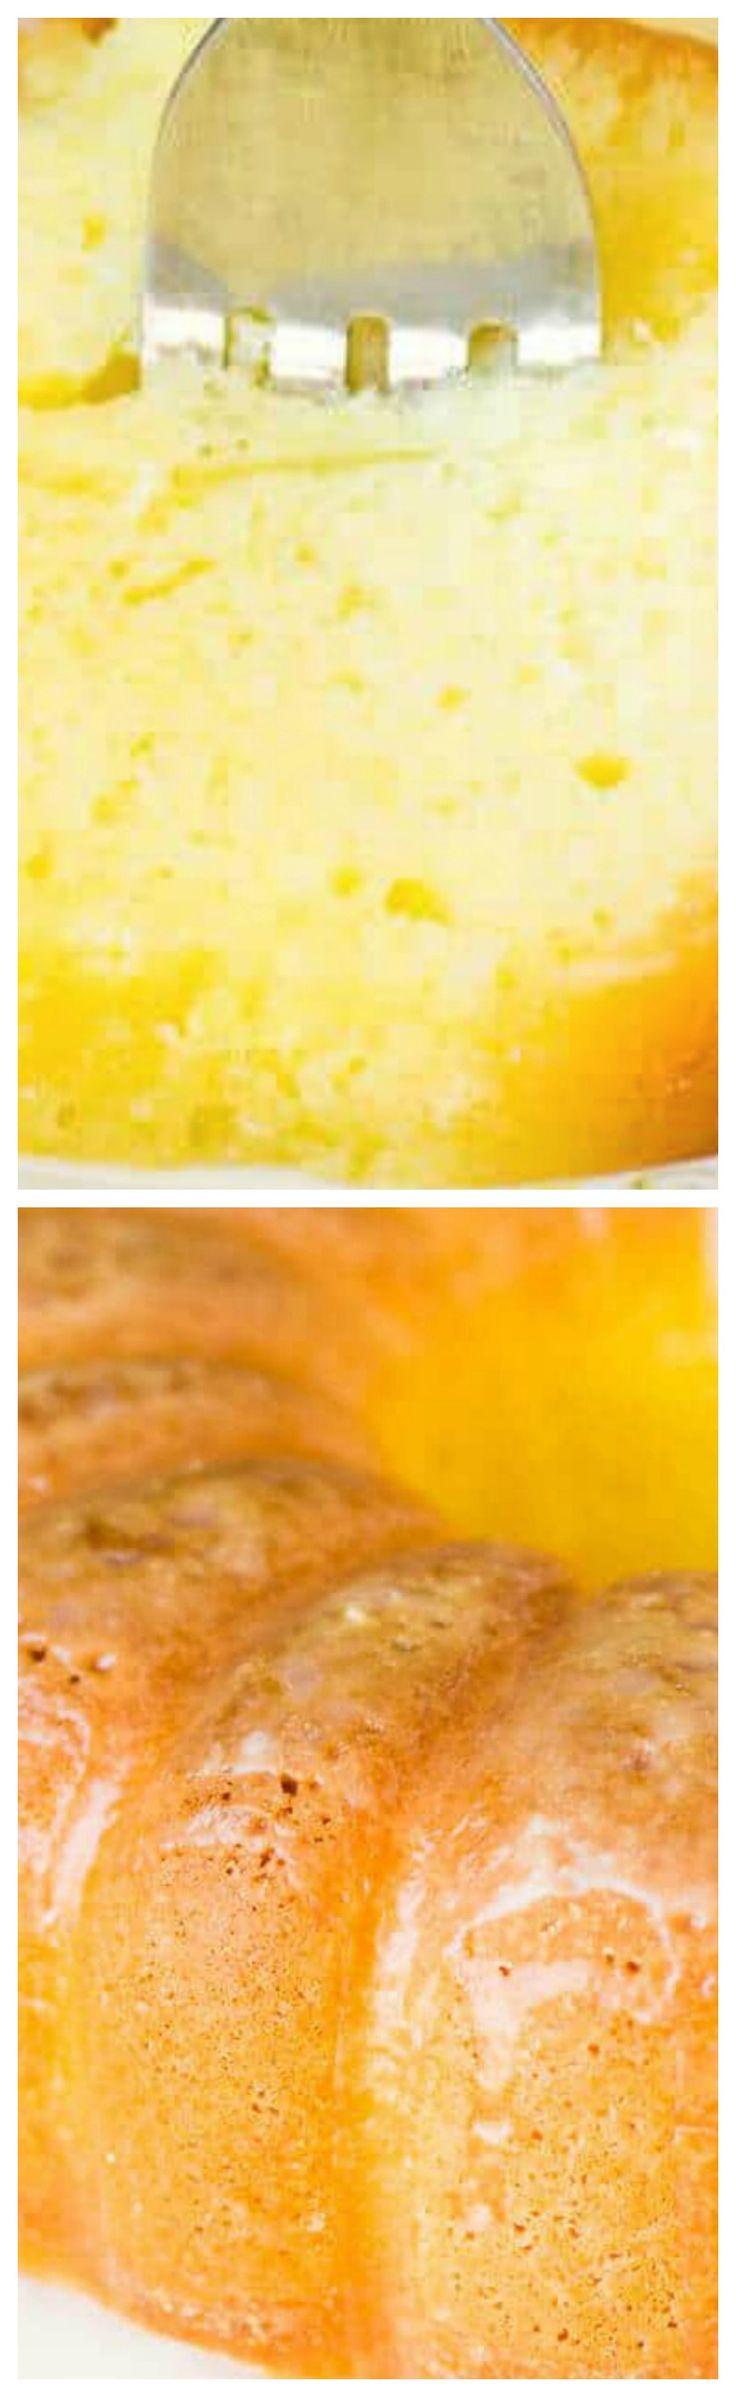 Lemon Pound Cake ~ Easy, moist and delicious... Lemon jello and a lemon glaze gives this semi-homemade bundt cake an amazing flavor.